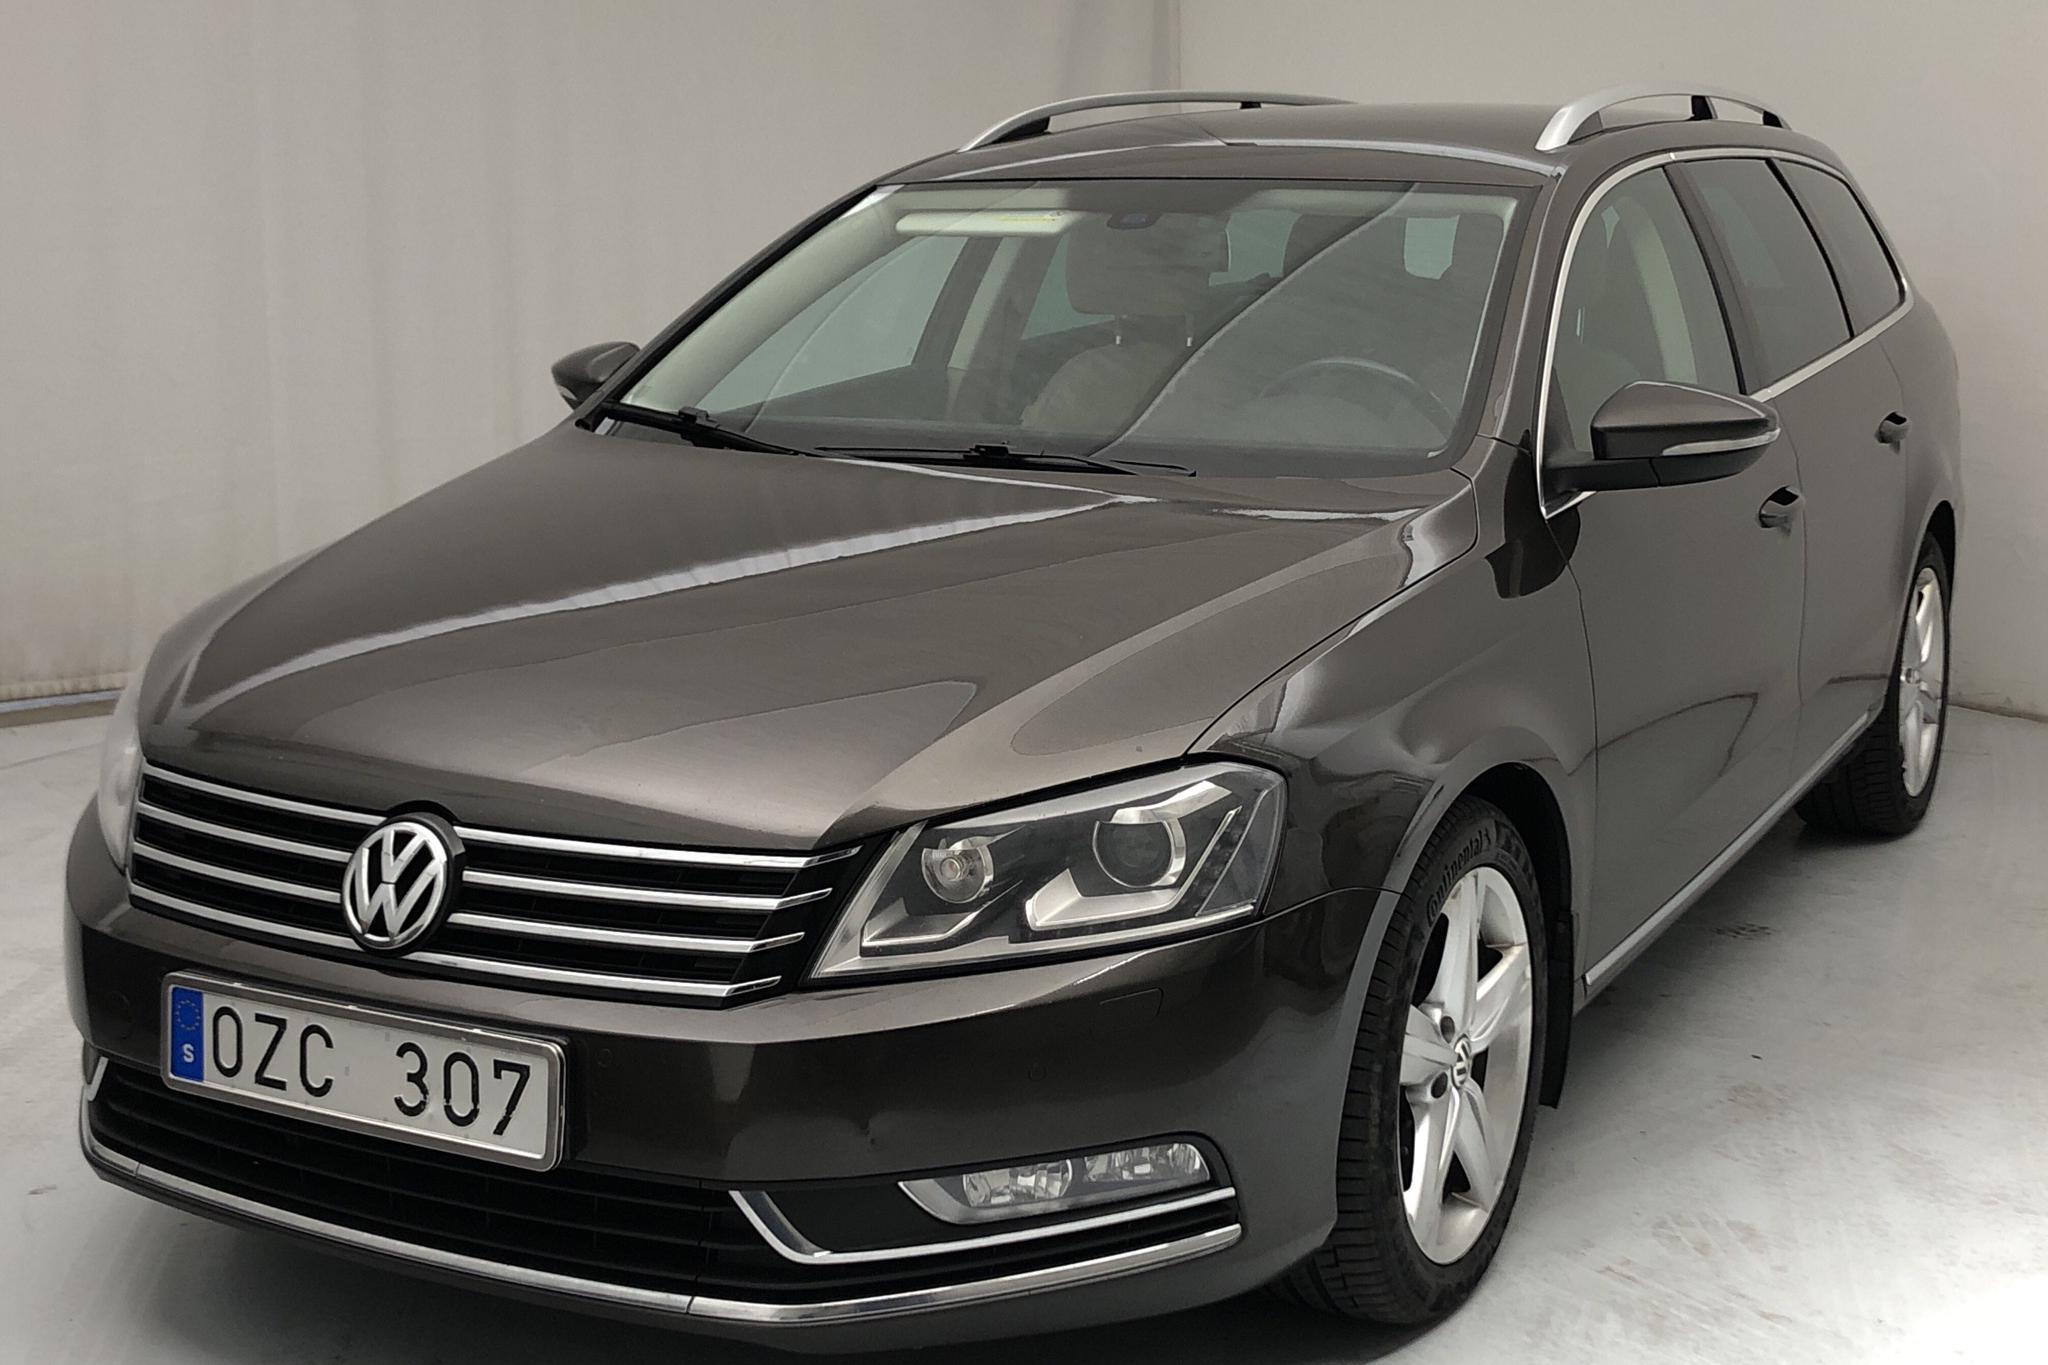 VW Passat 2.0 TDI BlueMotion Technology Variant 4Motion (170hk) - 209 790 km - Automatic - Dark Brown - 2013